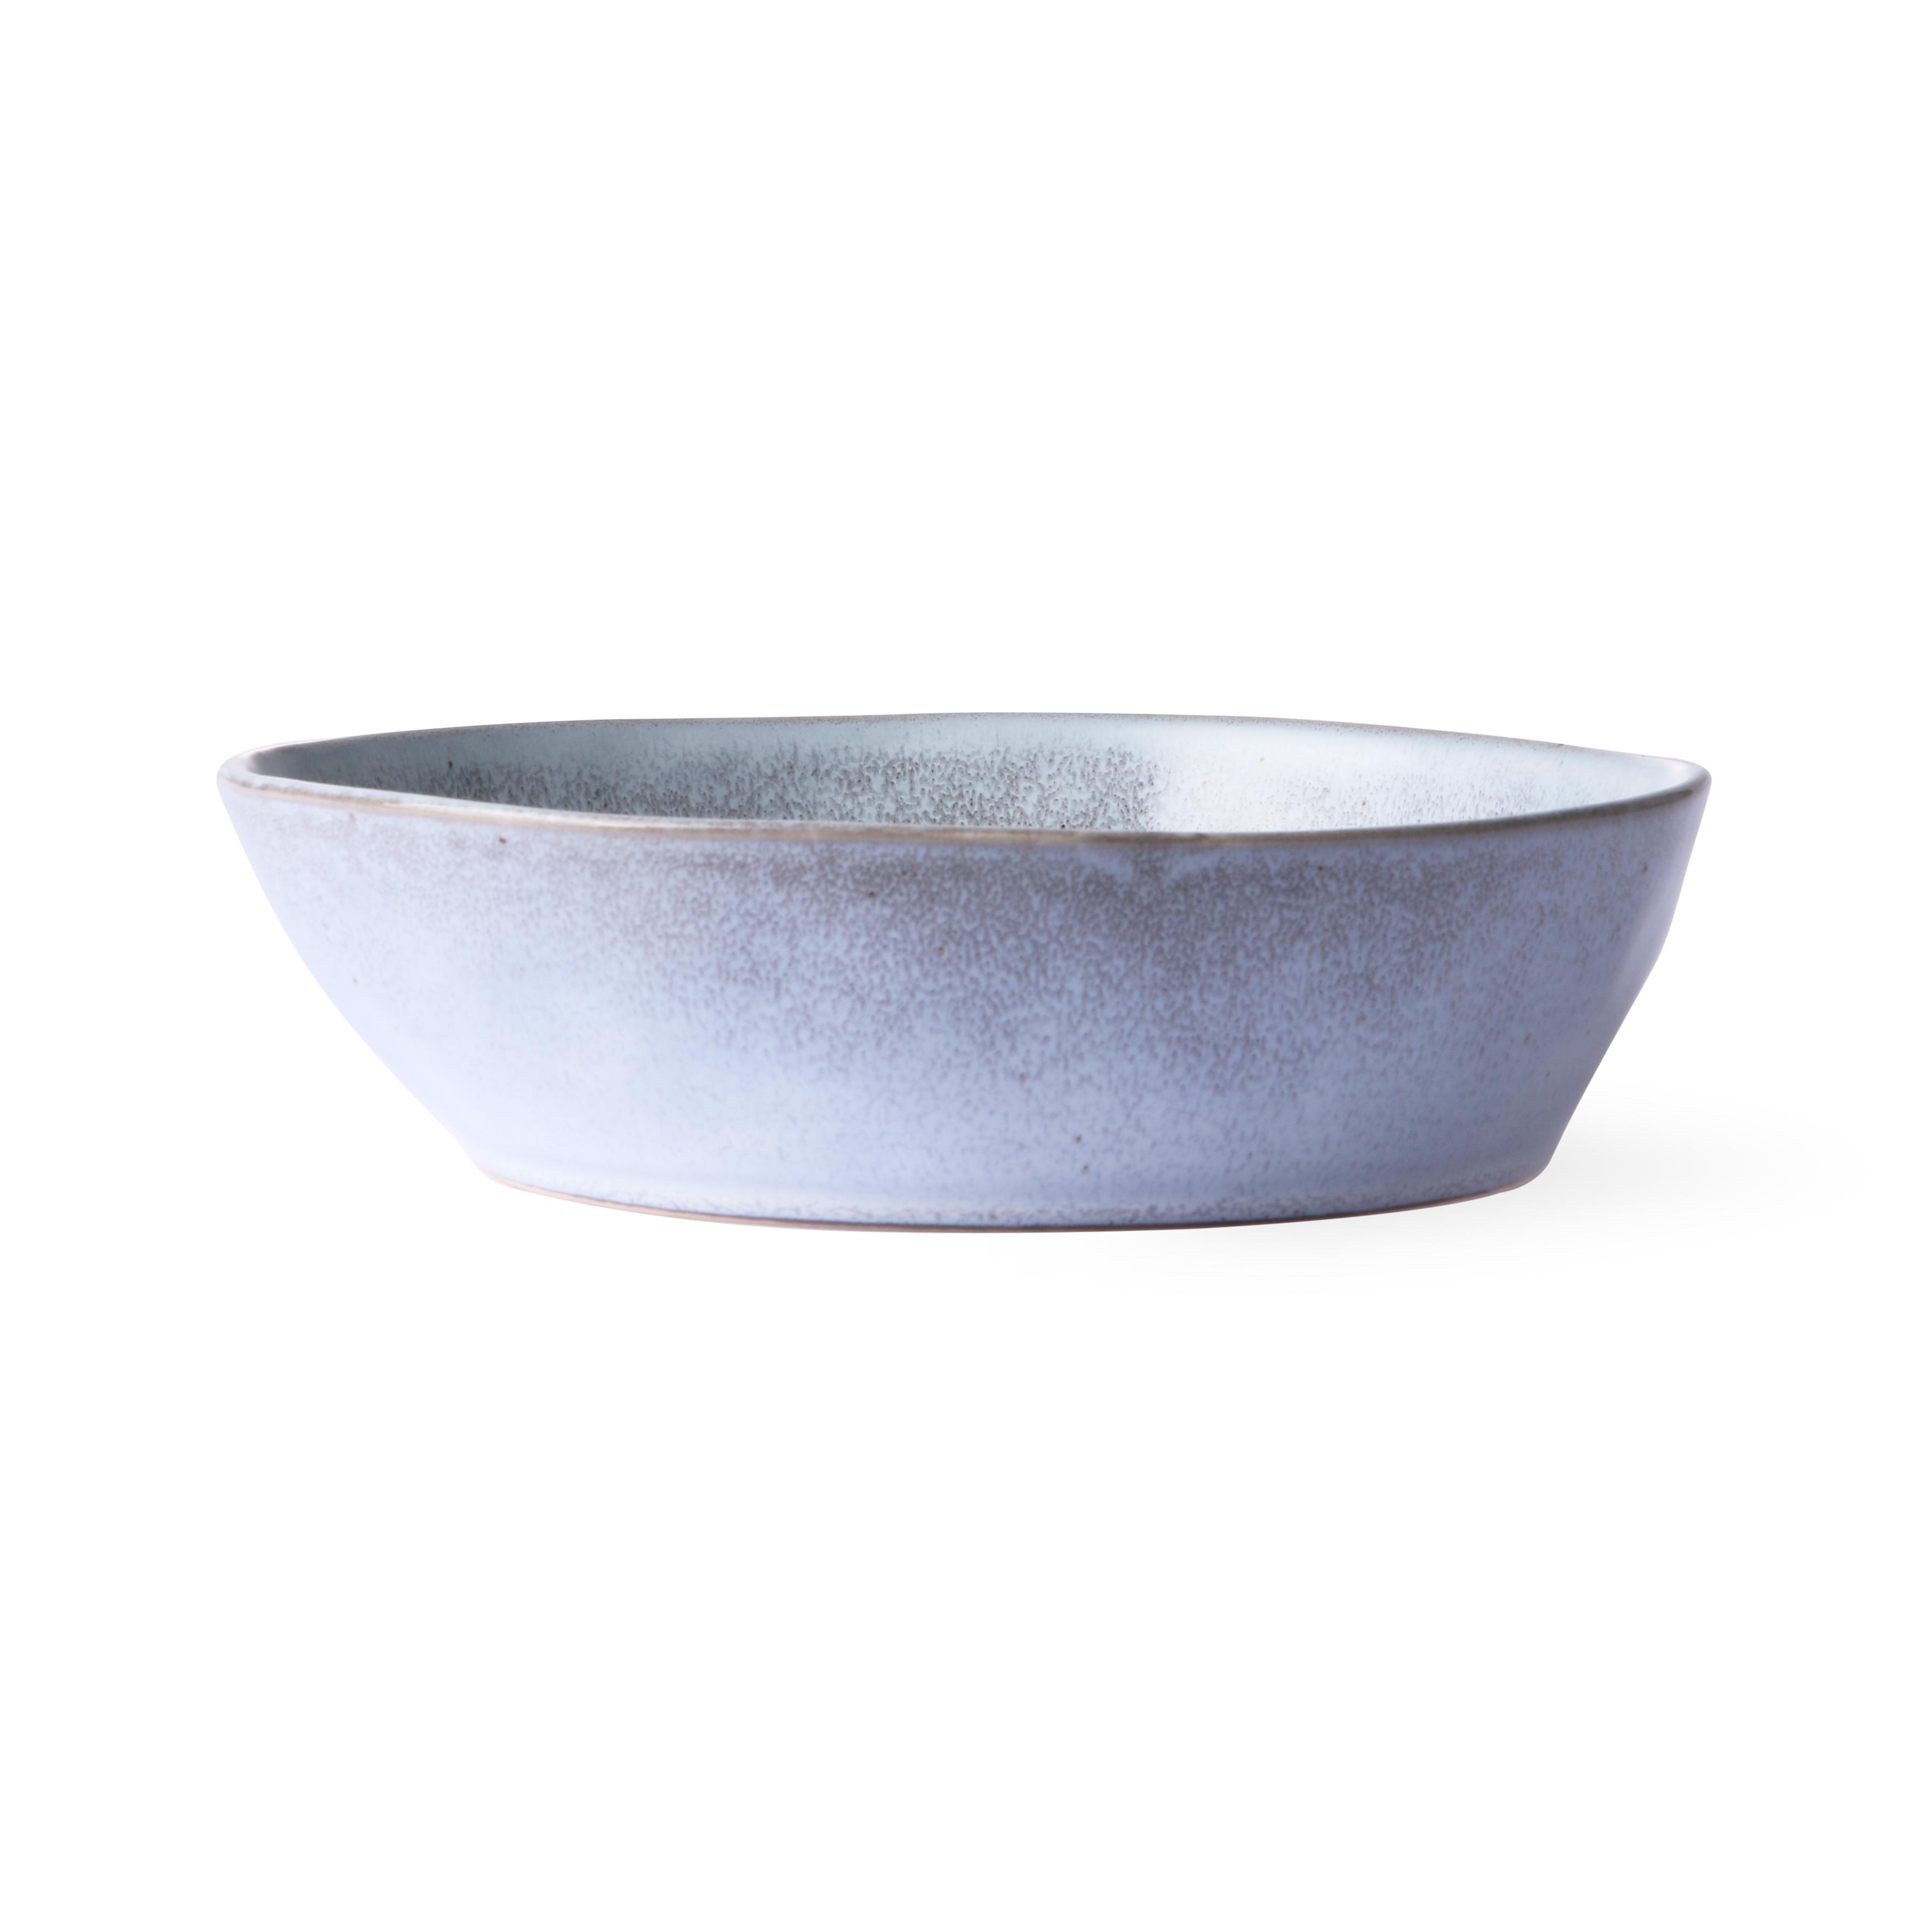 HK Living Bold & Basic Ceramics Schale rustic grey